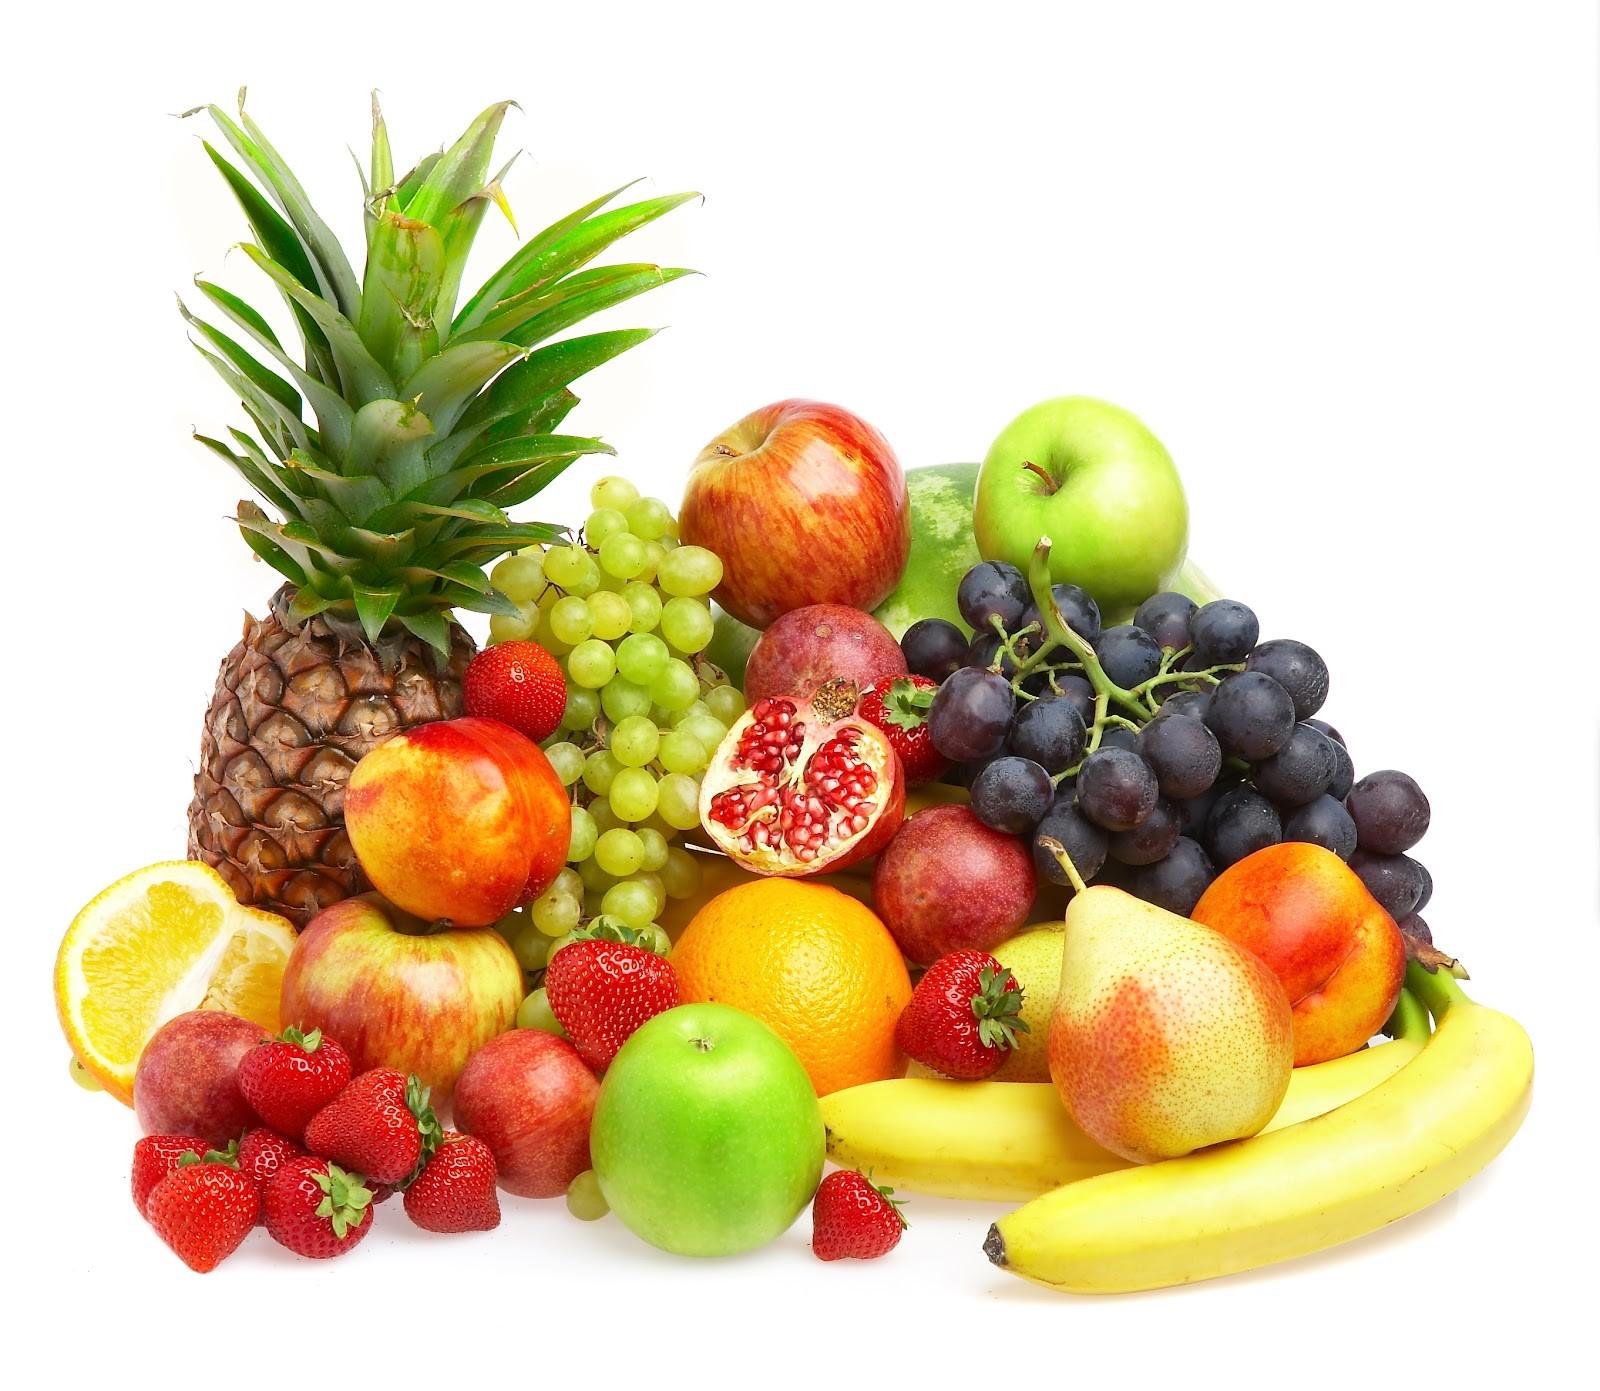 toma-fruta-pero-sin-pasarte